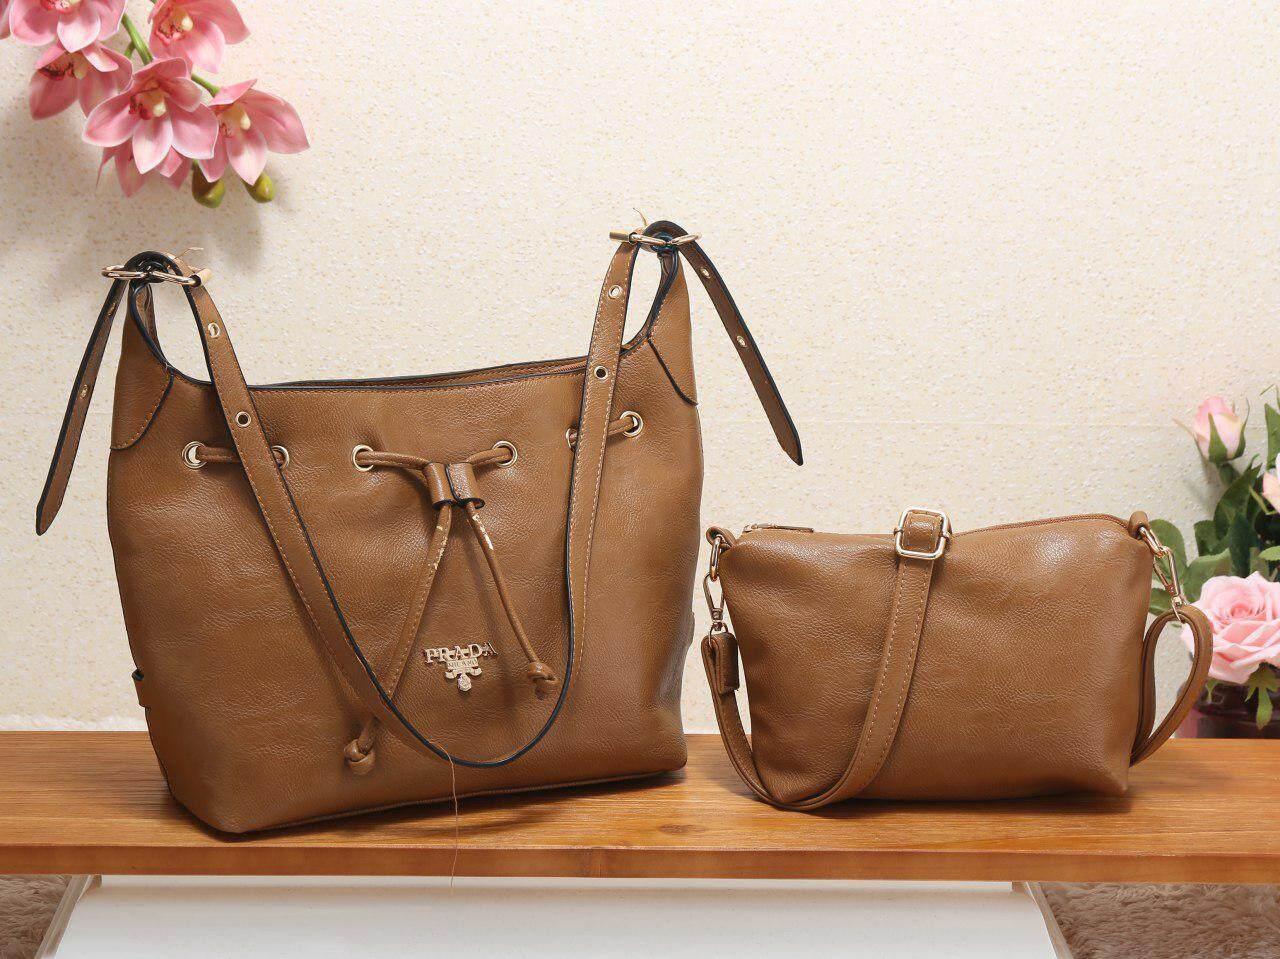 45841e25f74f Prada Women Cross Body & Shoulder Bags price in Malaysia - Best ...